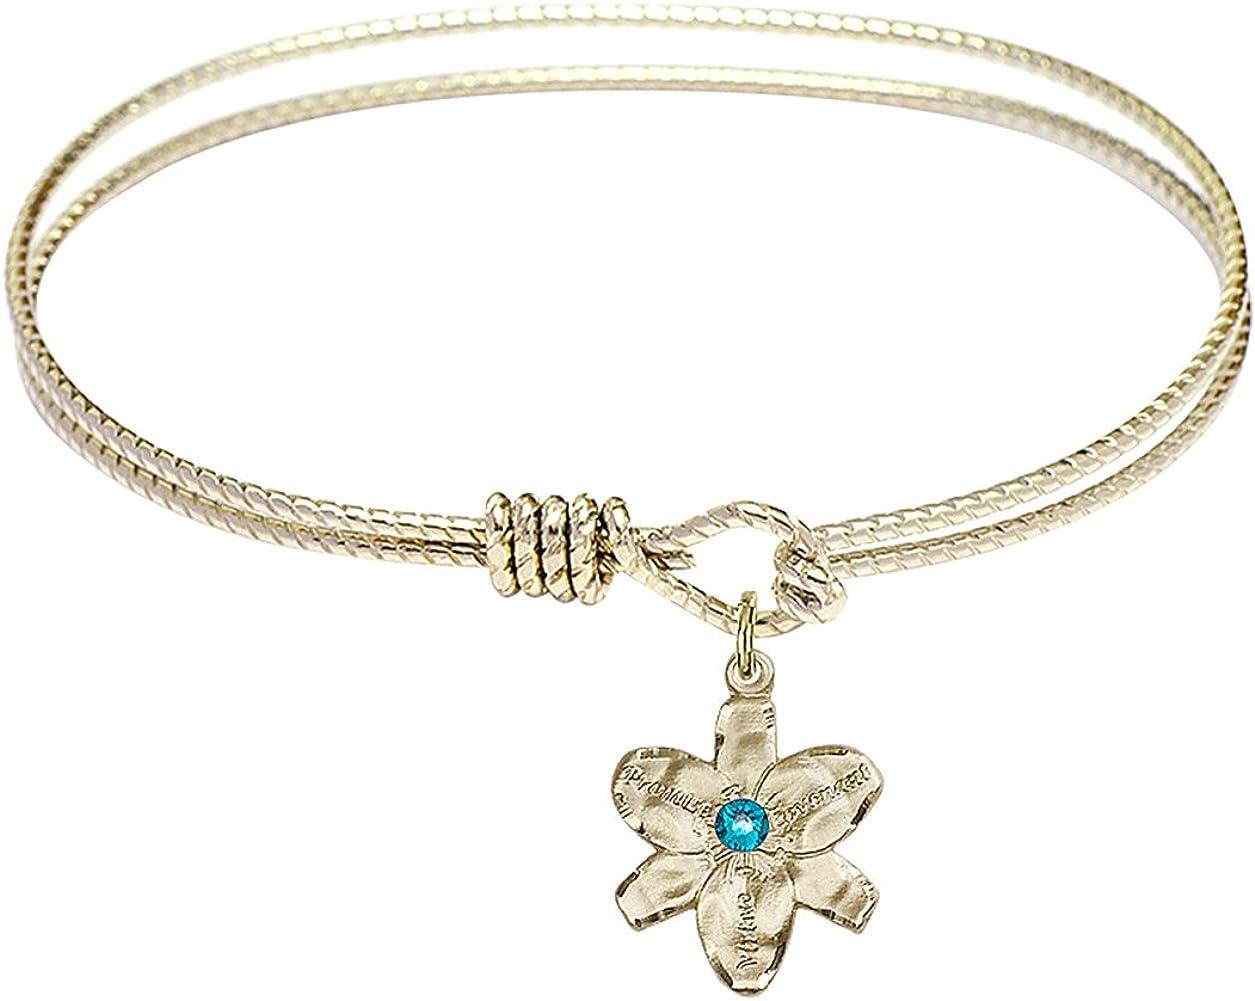 DiamondJewelryNY Eye Hook Bangle online Max 49% OFF shop Bracelet Chastity Charm. a with